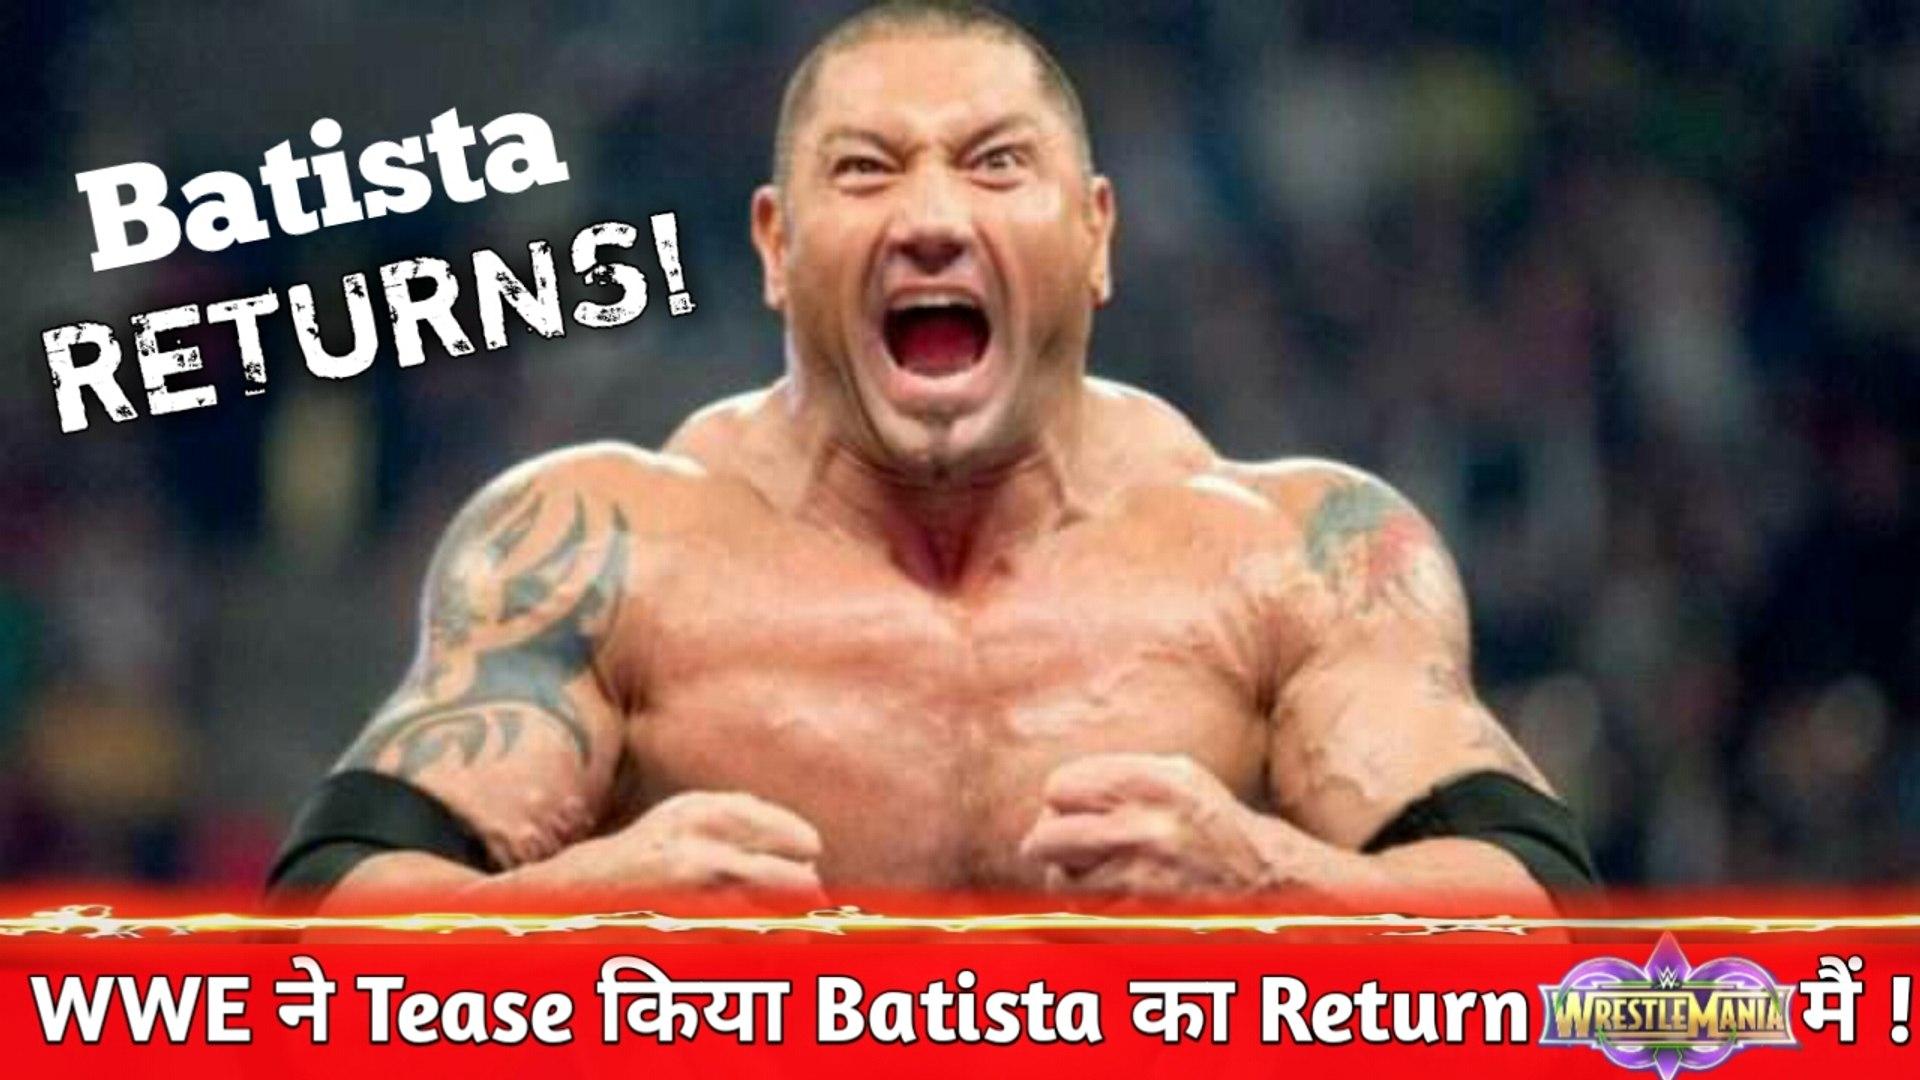 WWE Tease Batista Returns in WWE ! When Batista Returns in WWE?